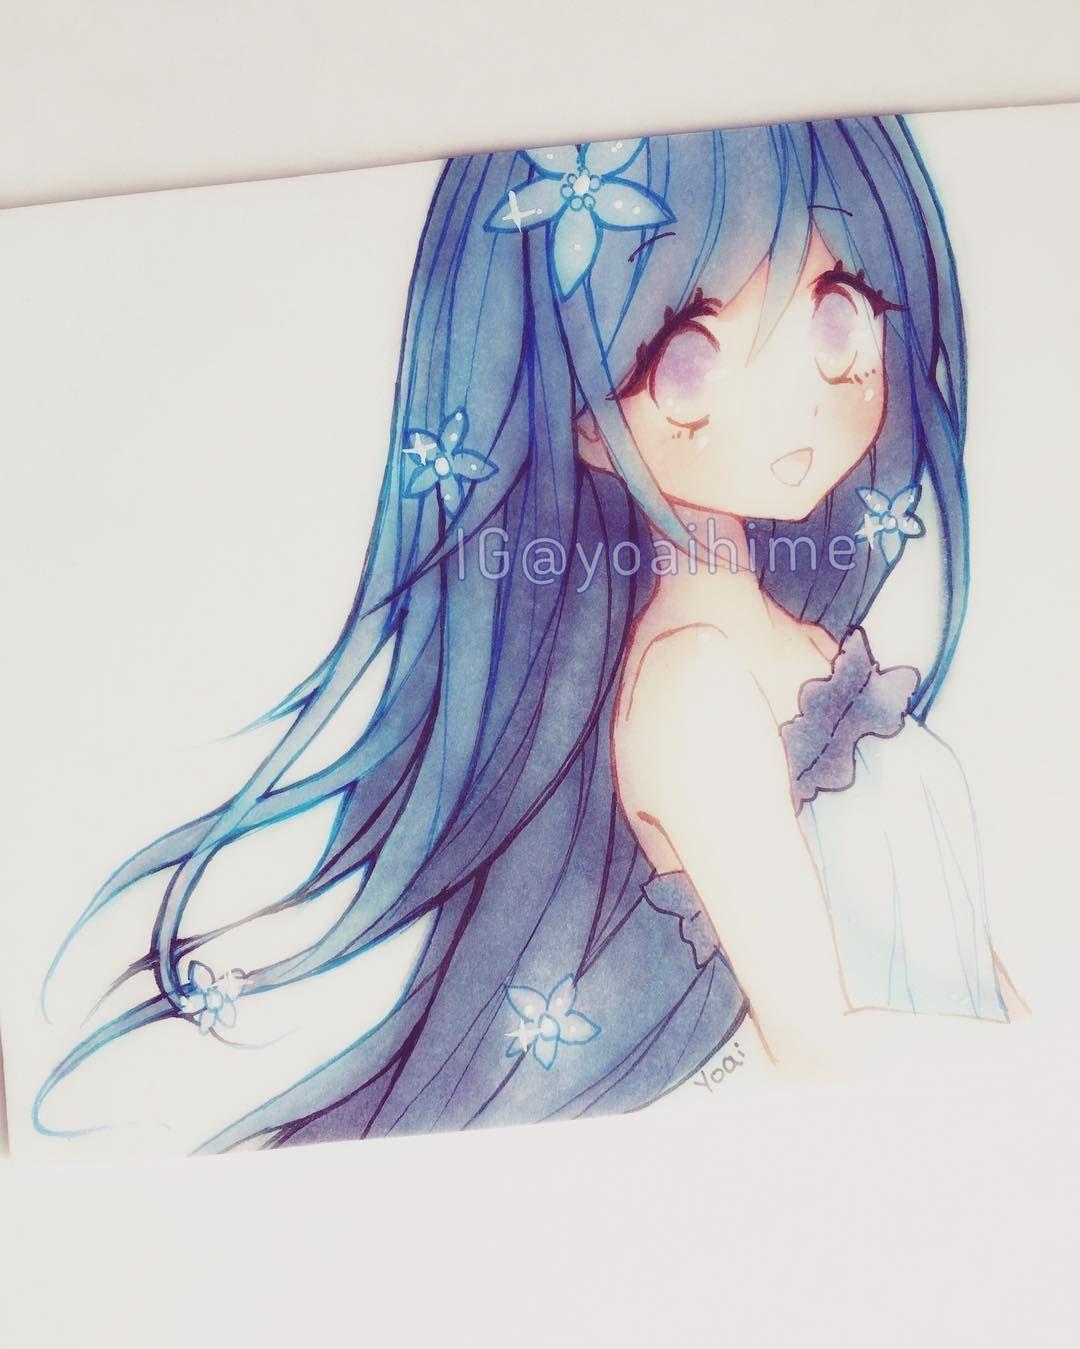 Pin by foxi renarde on kawaii pinterest anime instagram and kawaii